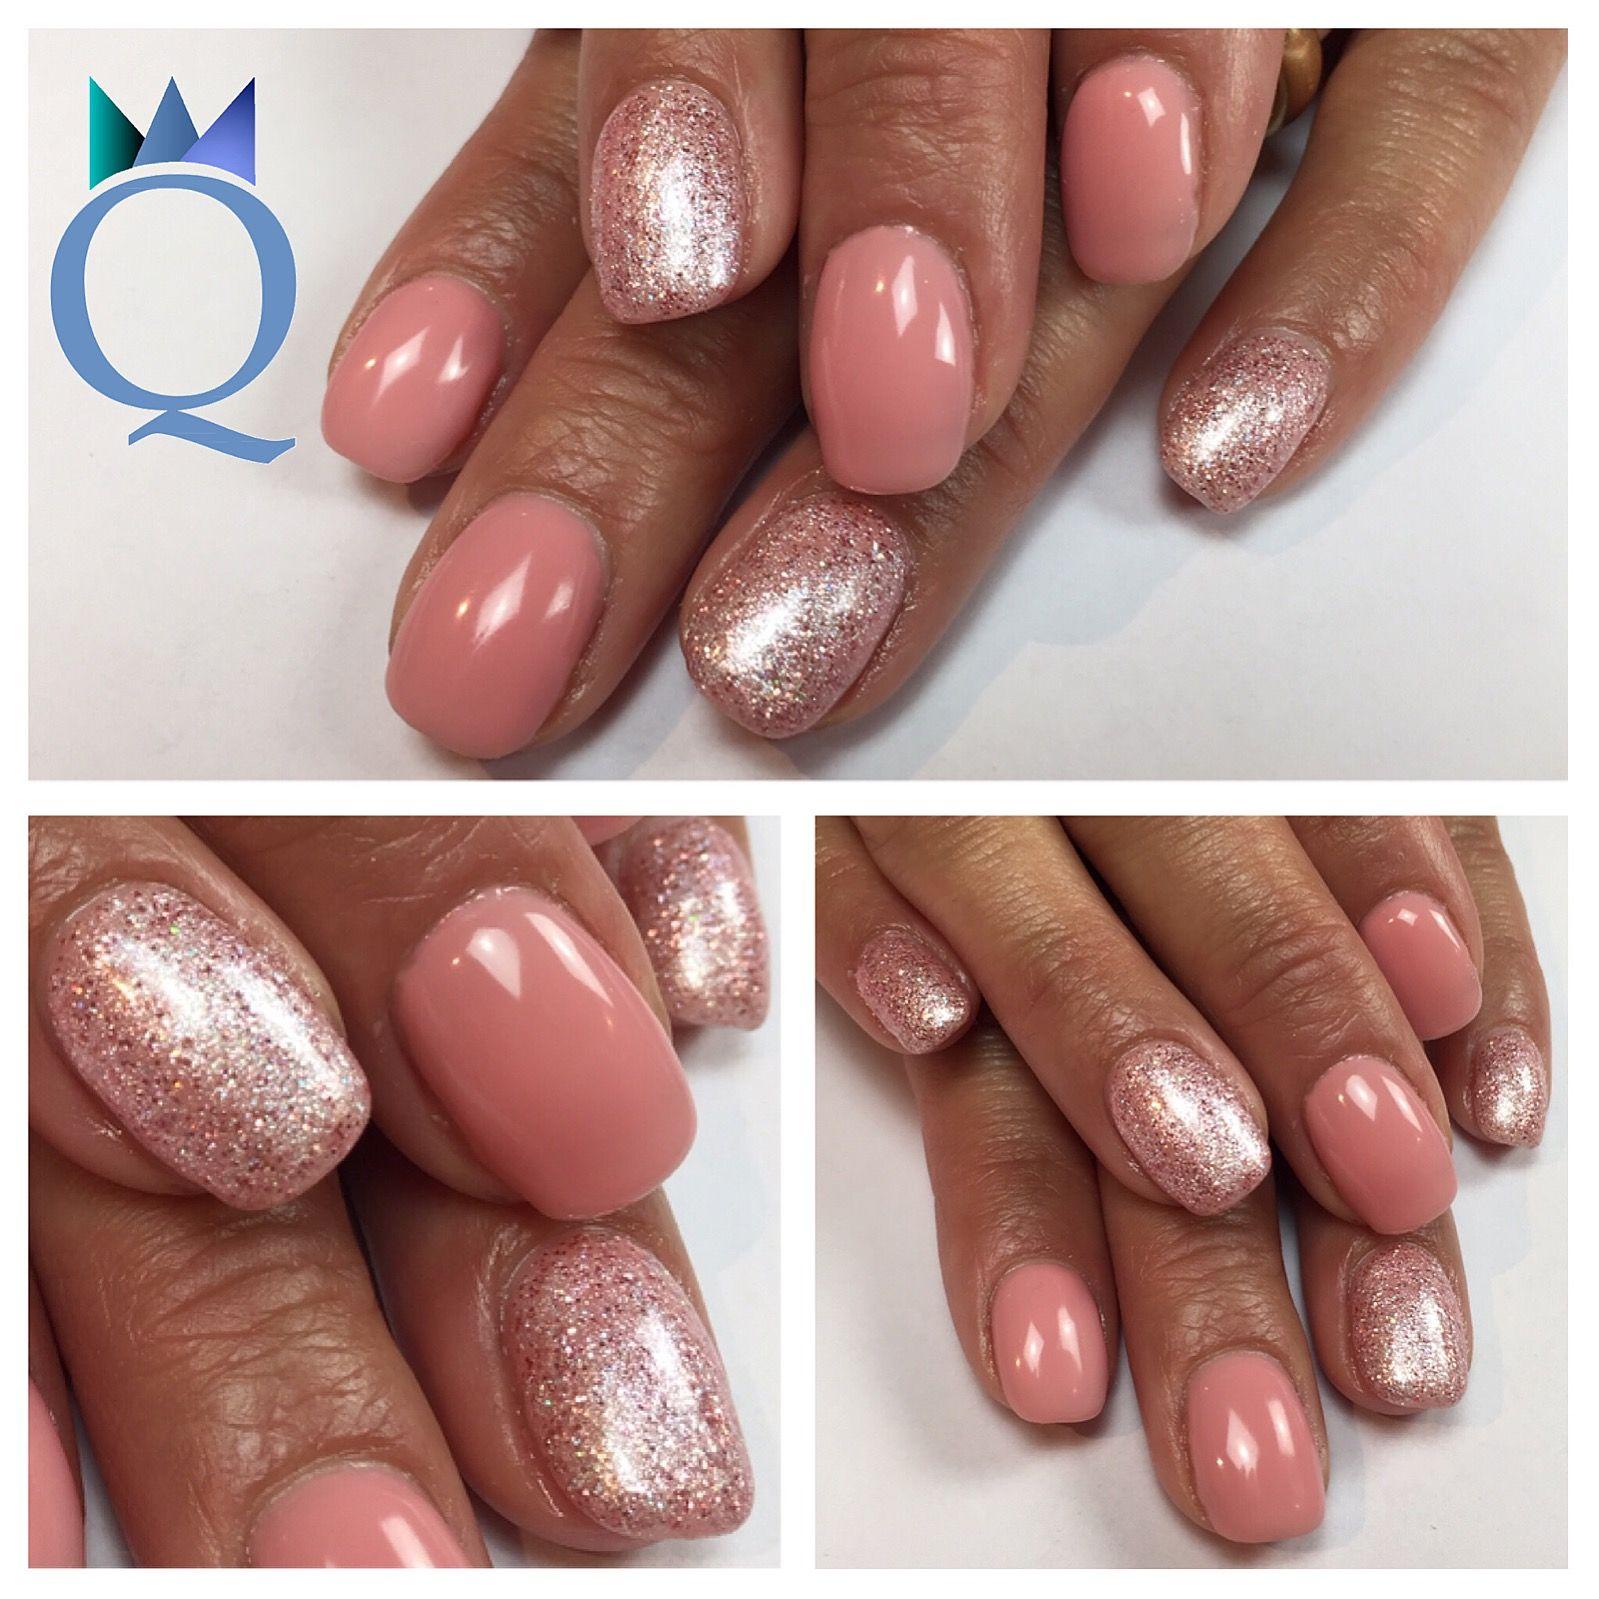 shortnails #gelnails #nails #rose #white #glitter #akyado ...